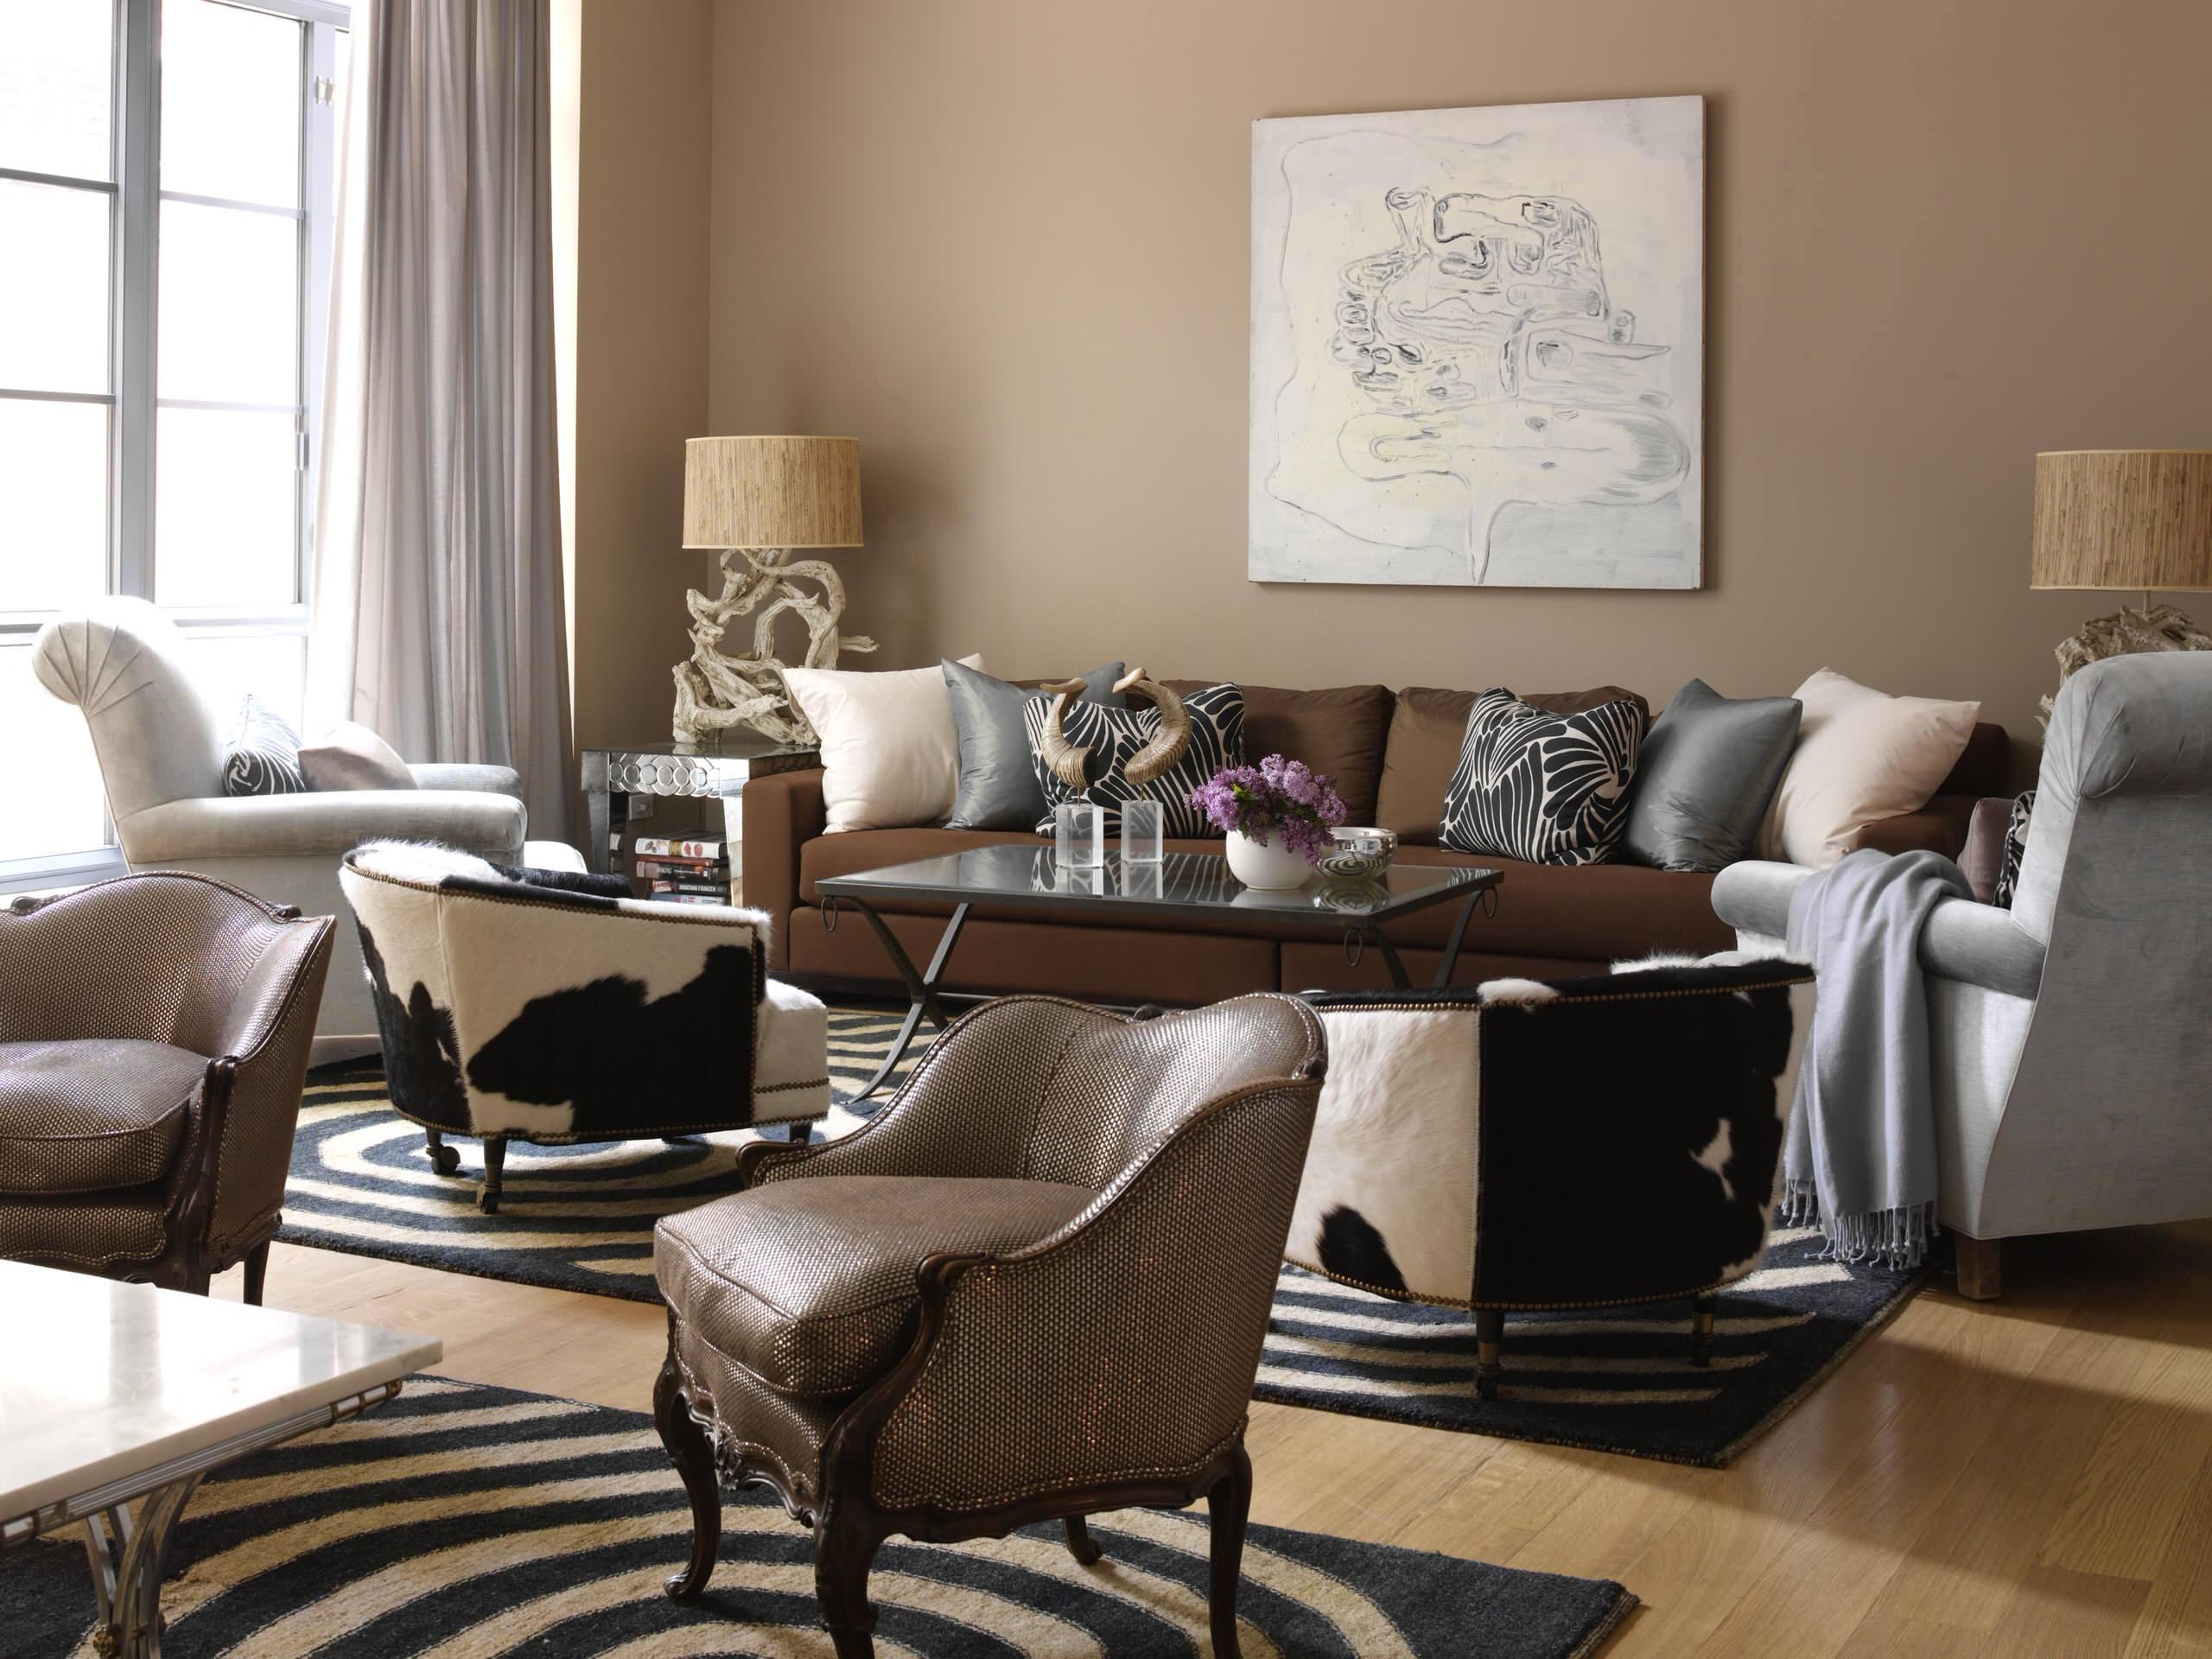 Beige And Cream Color Palette Living Room Ideas Photos Houzz